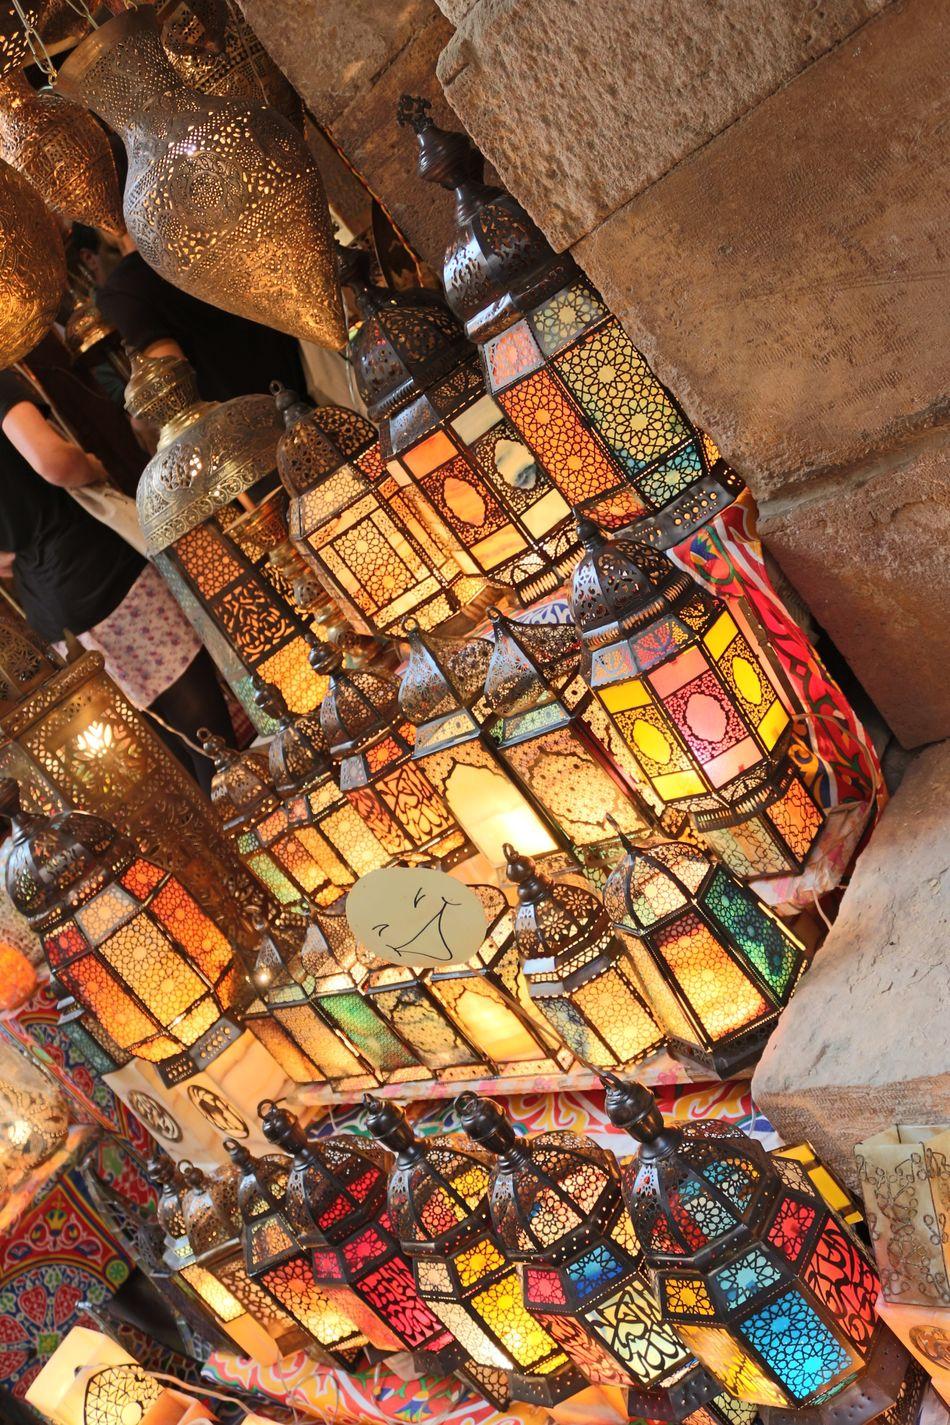 Thisisegypt Khanelkhalili Lamps And Lights. Lamps